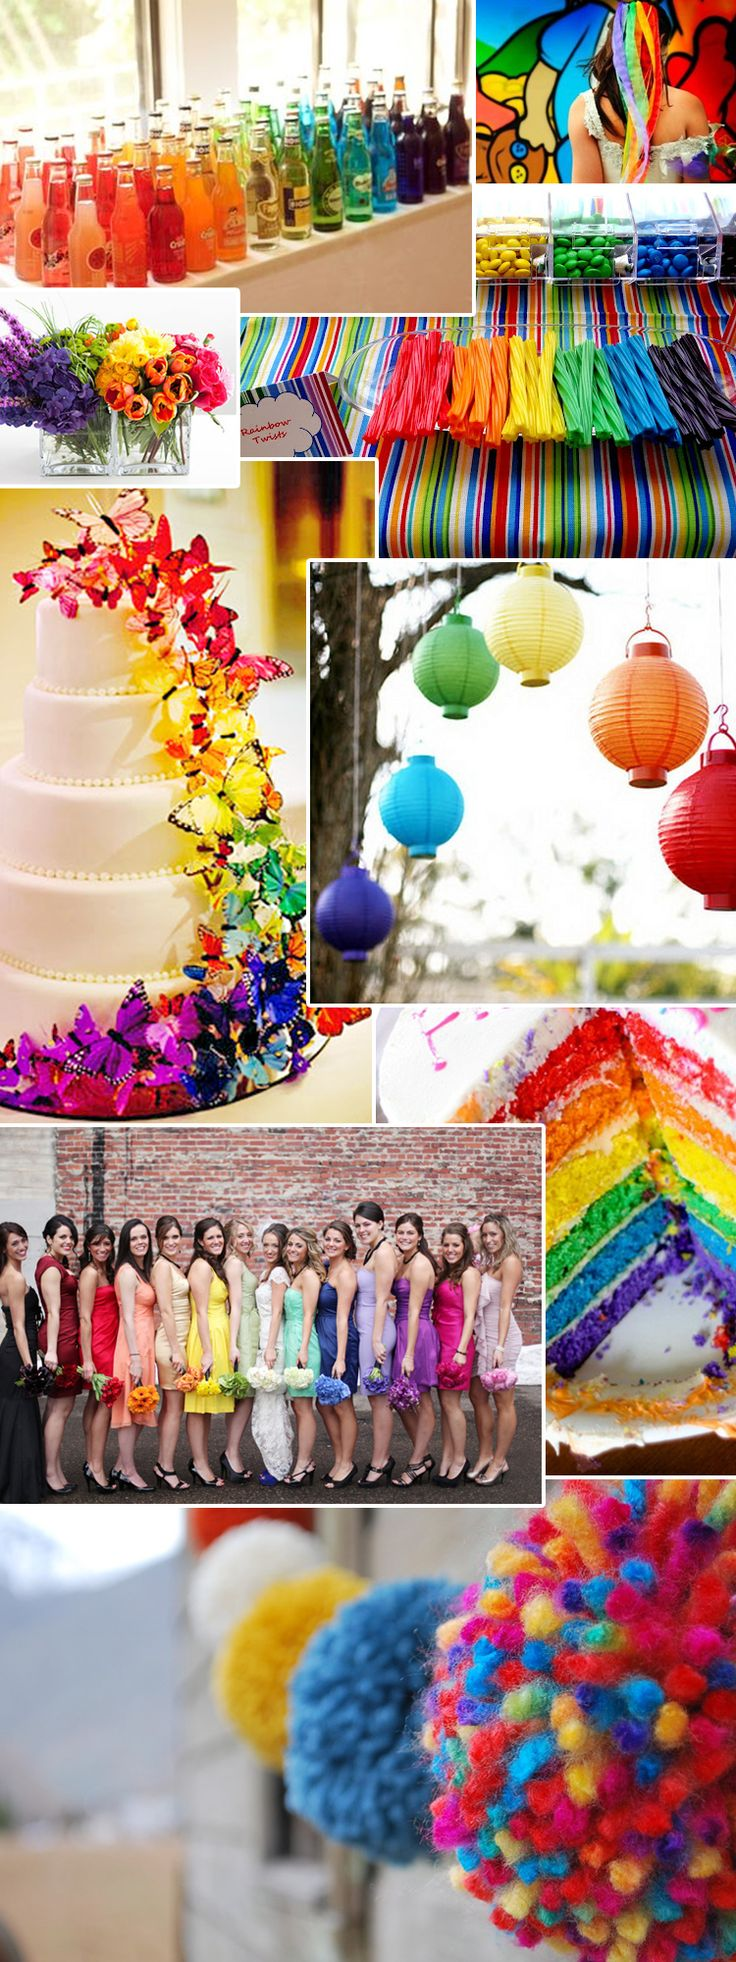 Rainbow style wedding http://www.roxypopevents.com/2012/04/rainbow-bright/